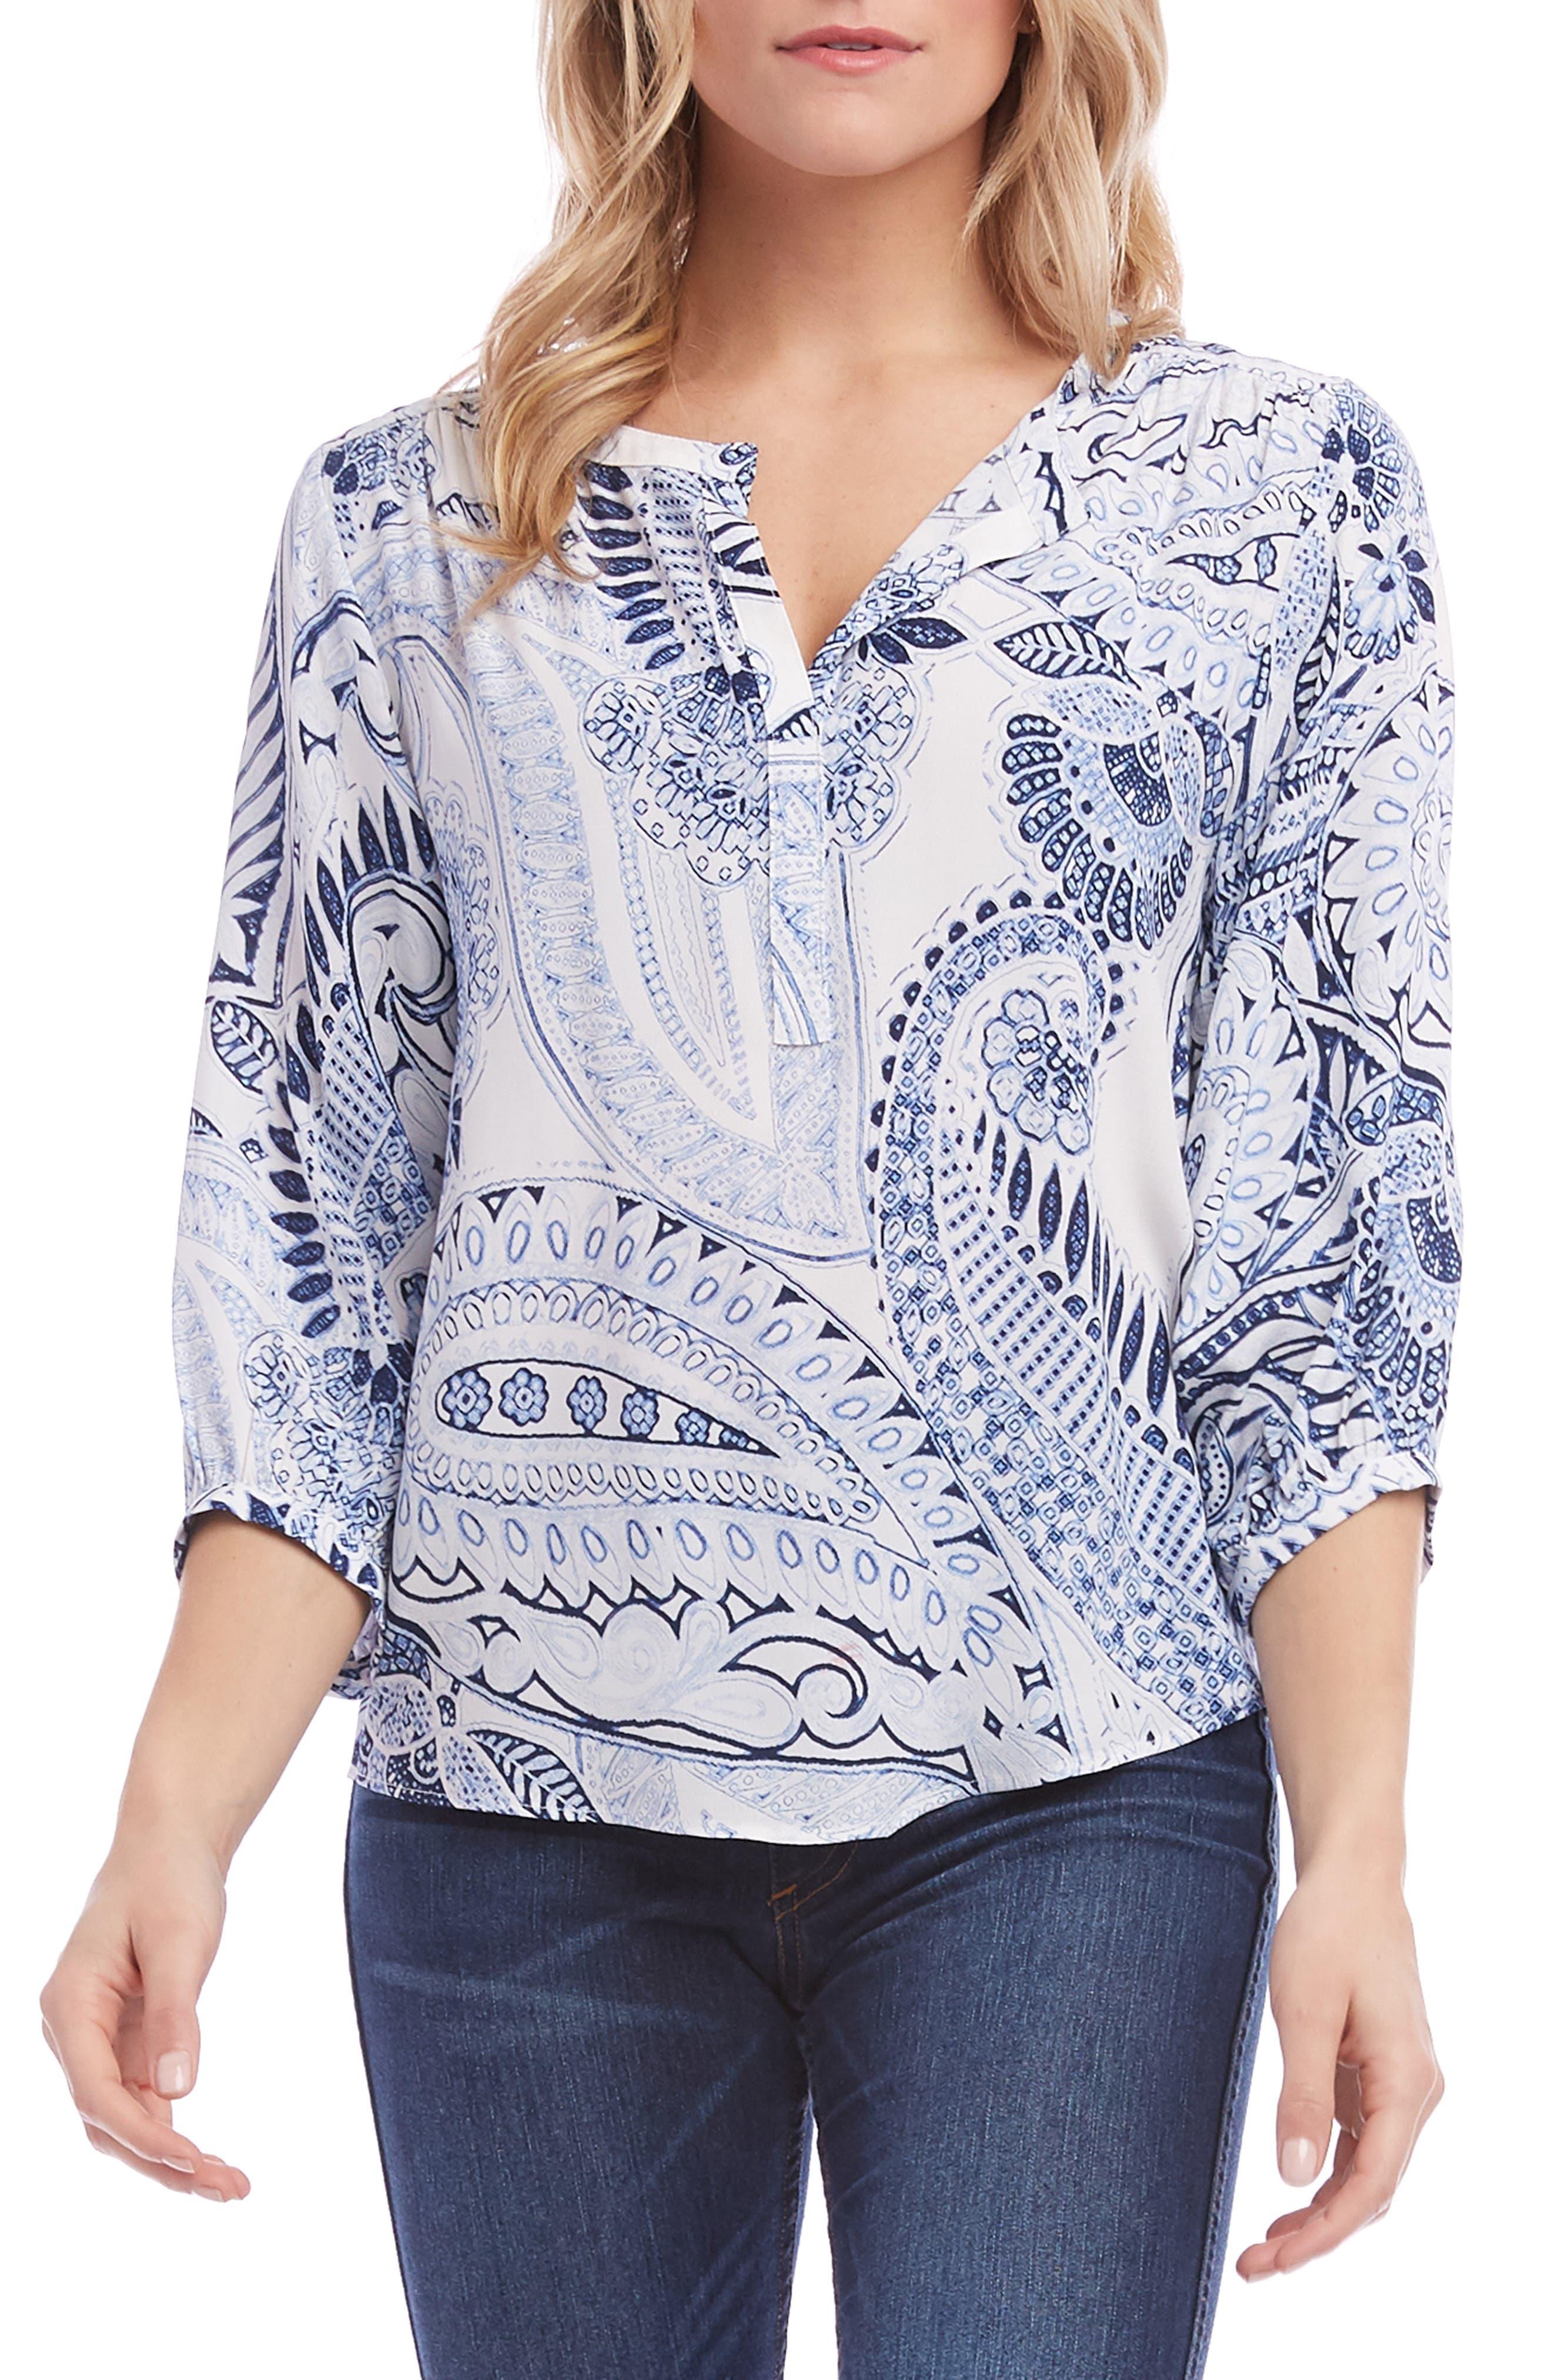 KAREN KANE Blouson Sleeve Top, Main, color, BLUE